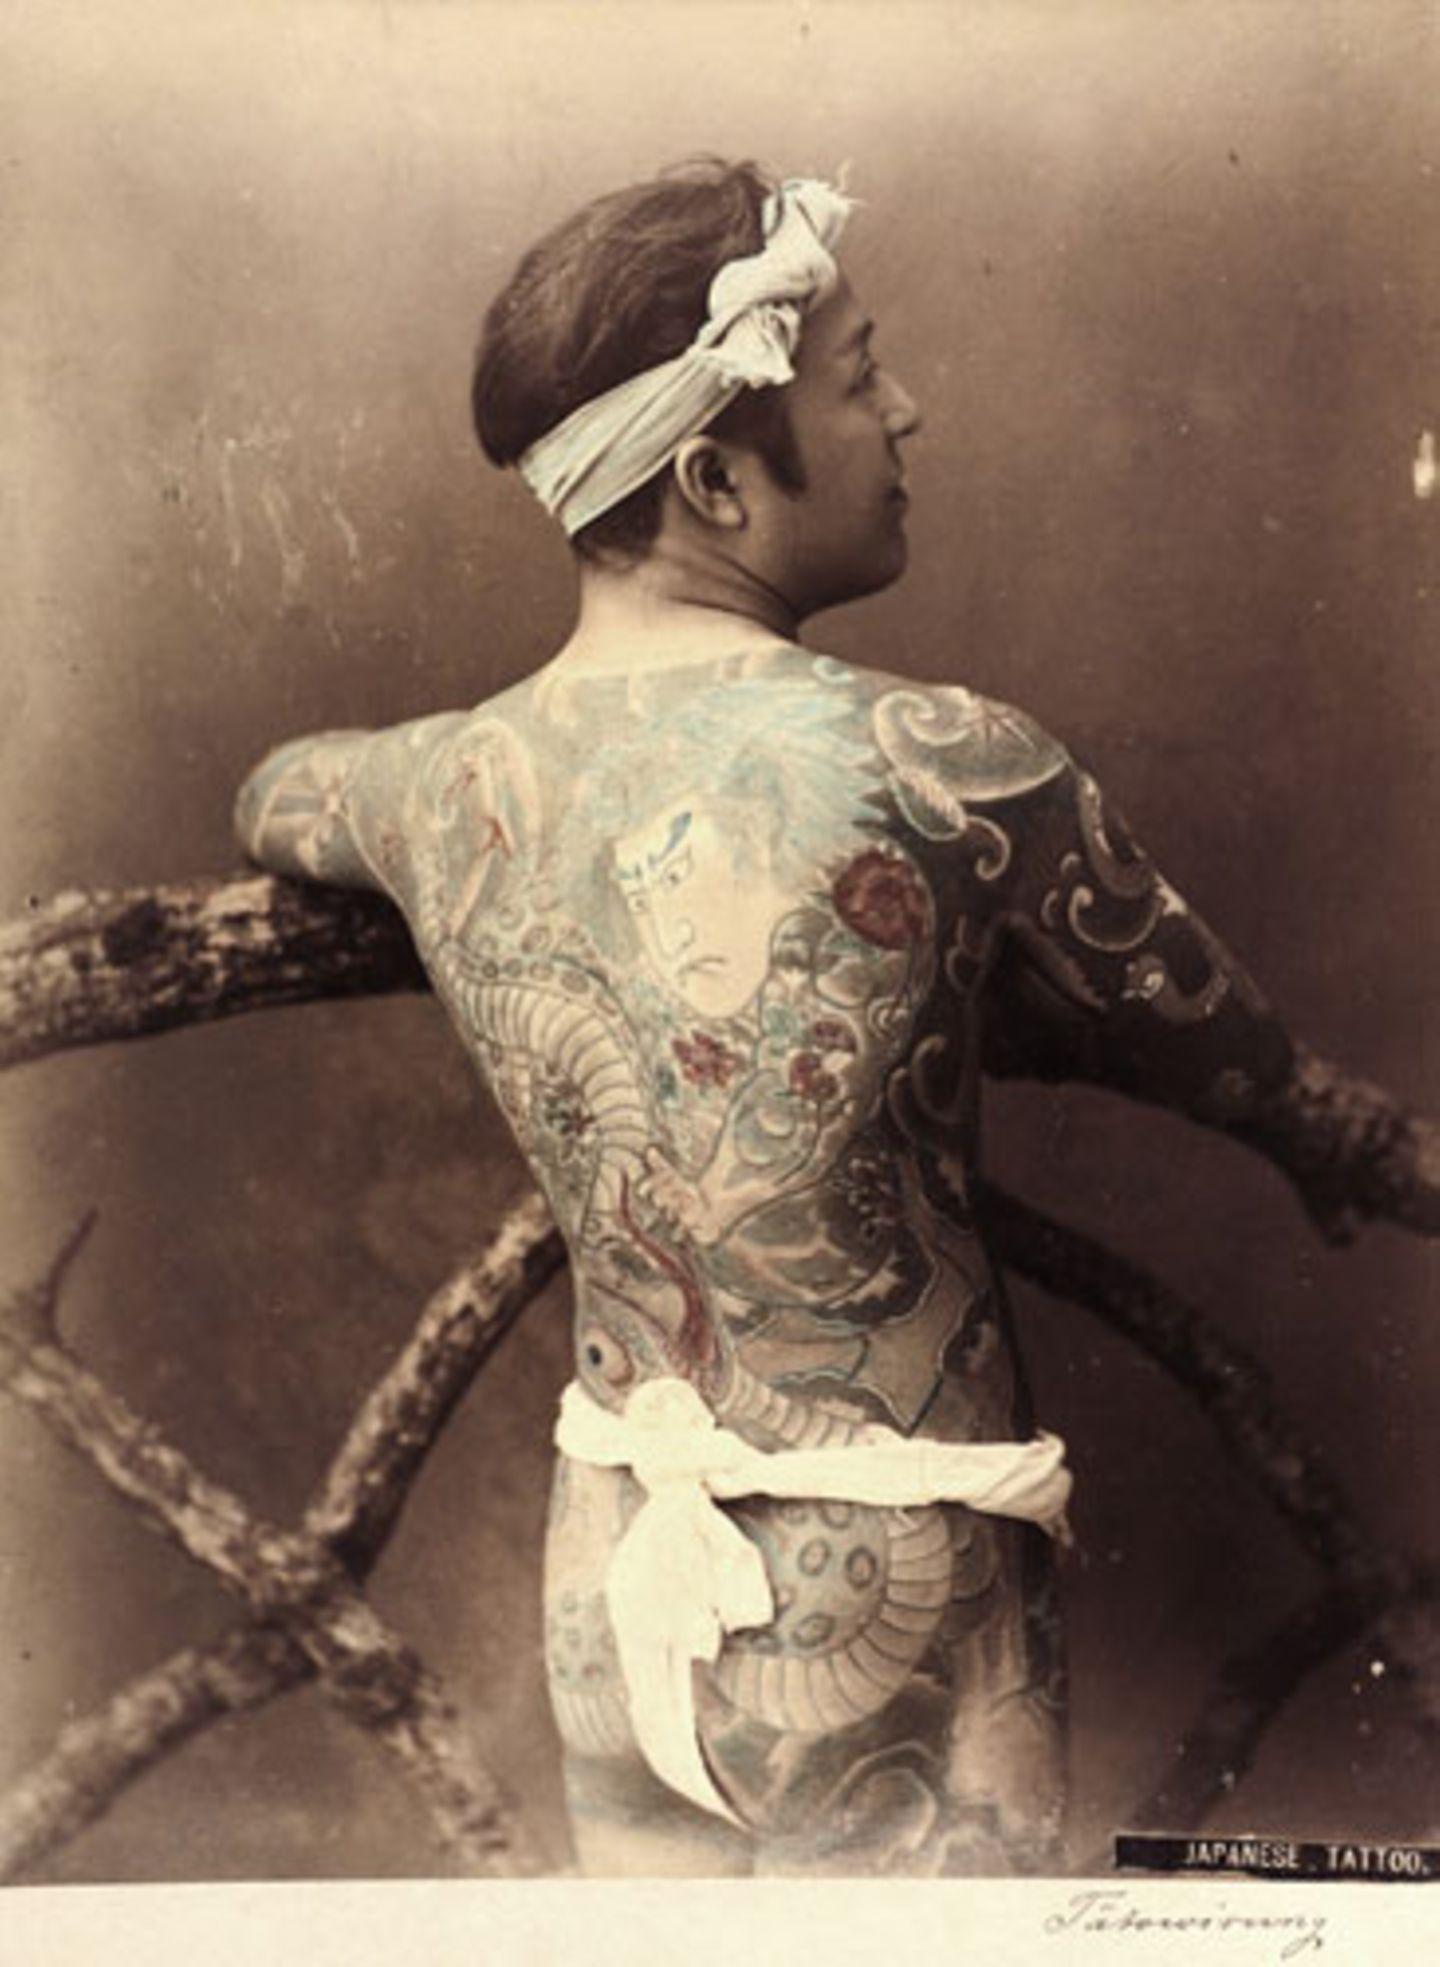 Japanese Tattoo, 1880-1890